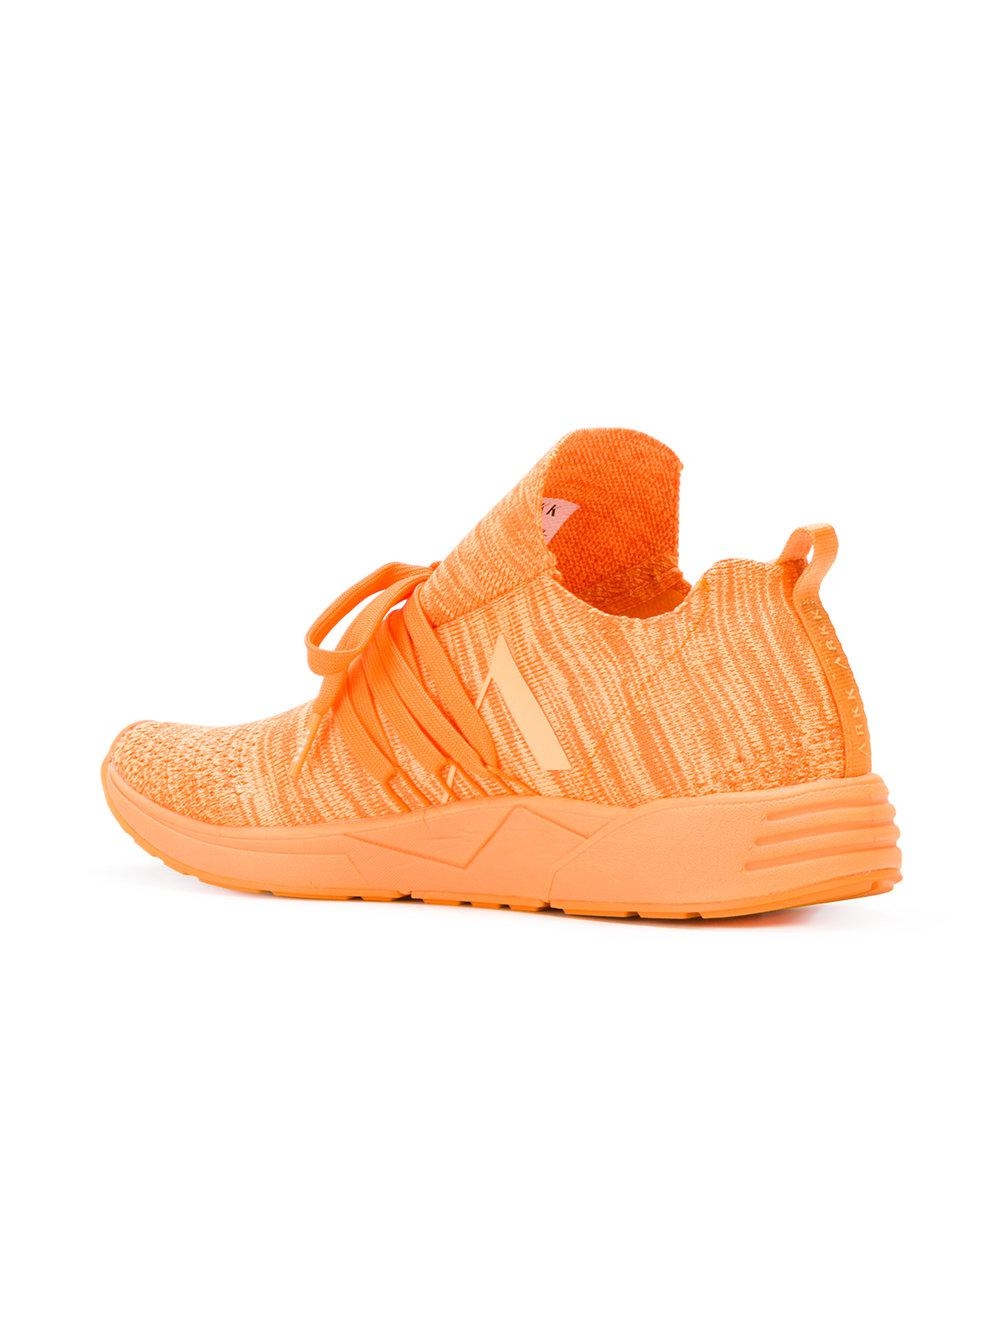 Arkk Rubber Raven Future Grid 2.0 Sneakers in Yellow & Orange (Orange)